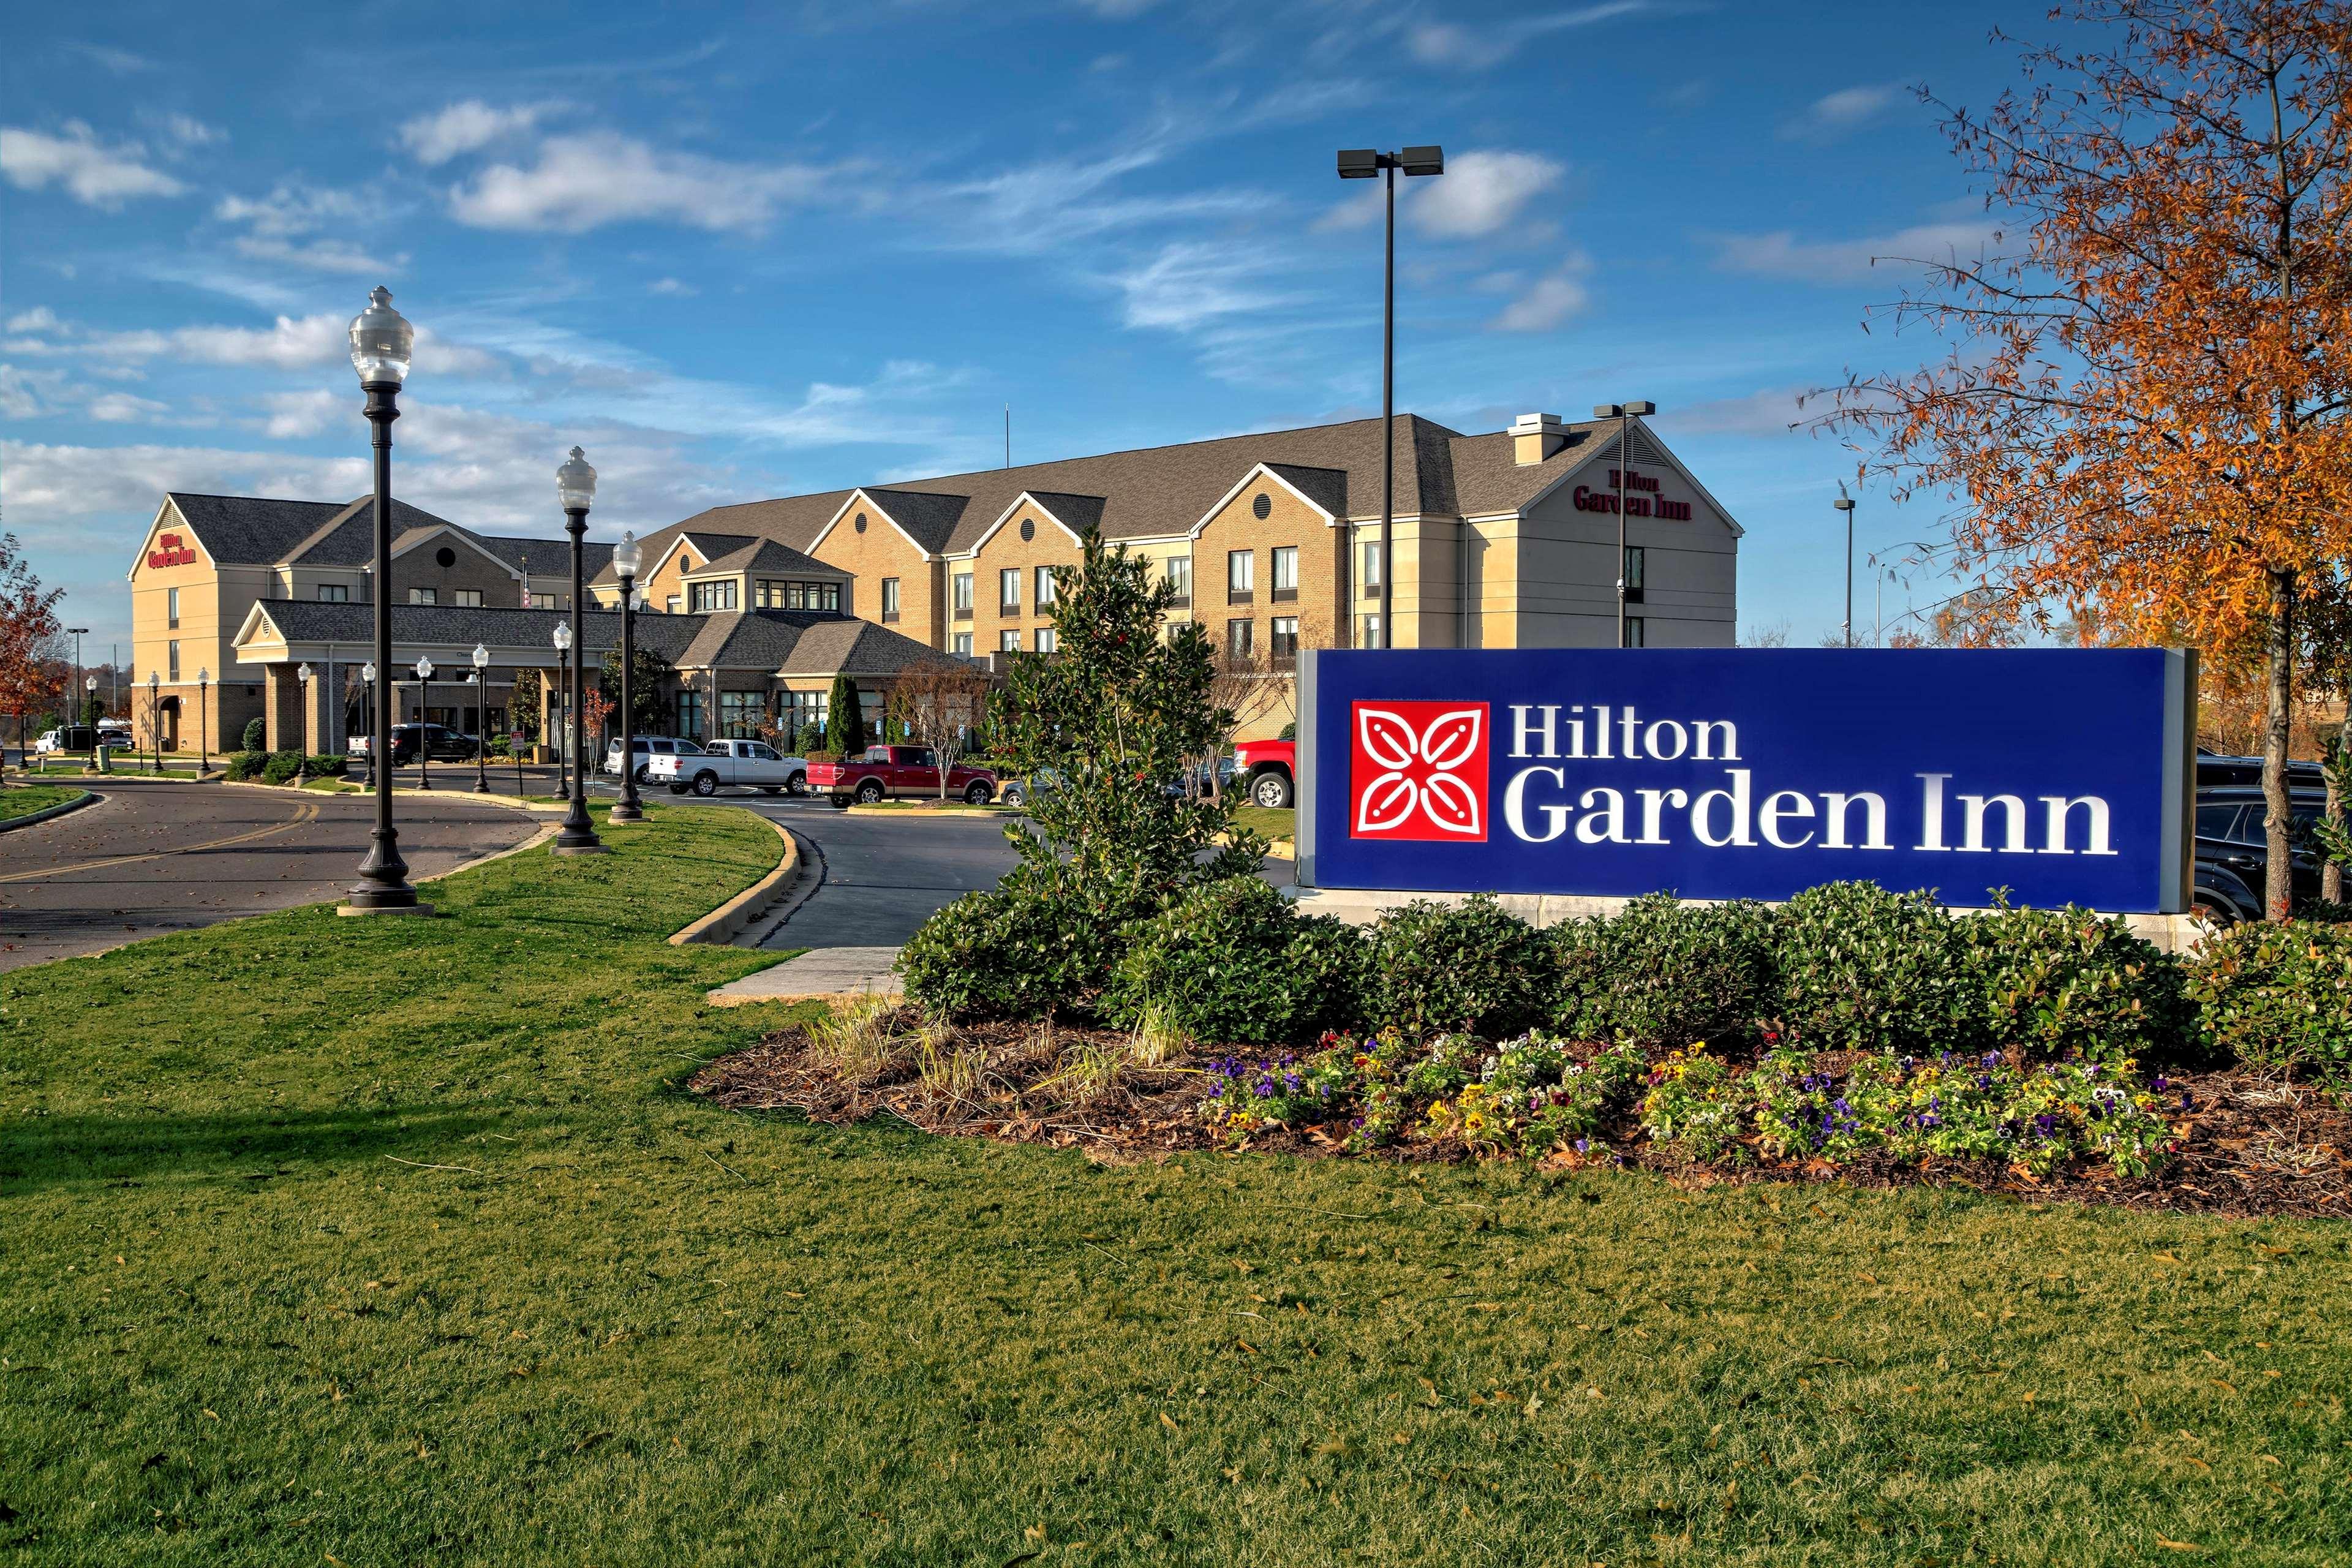 Hilton Garden Inn Memphis/Southaven, MS image 23